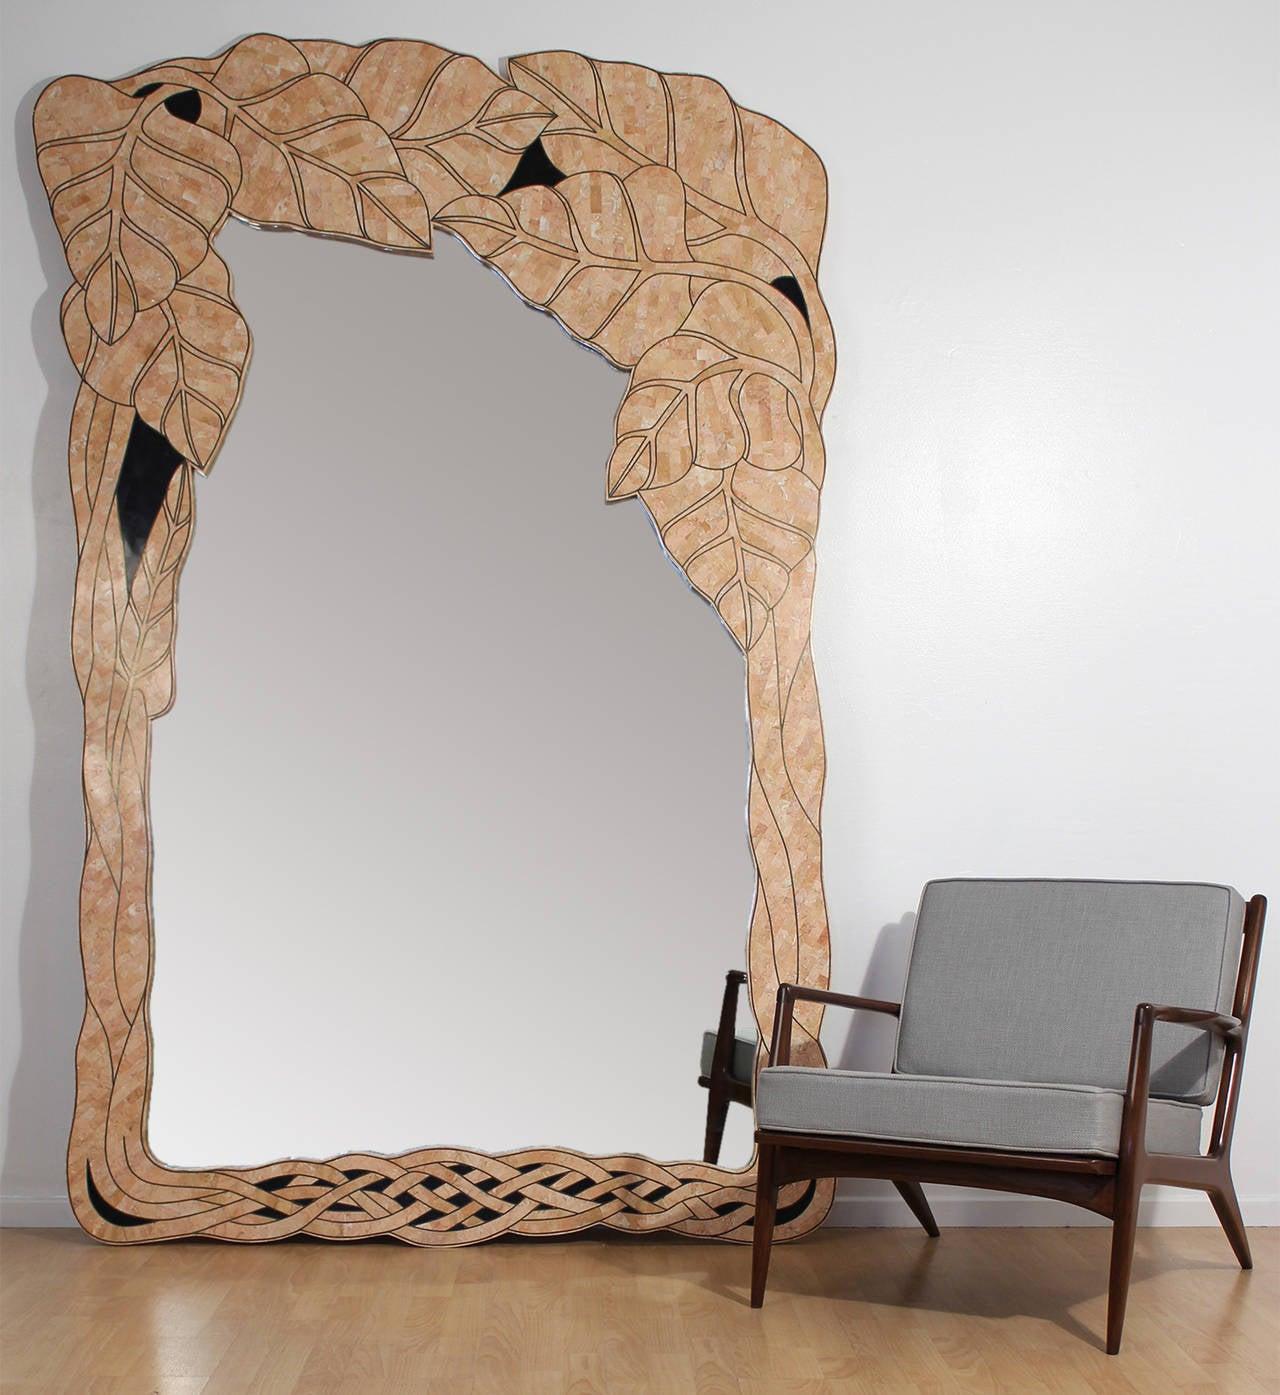 7 Foot Tall Floor Mirror Home Ideas